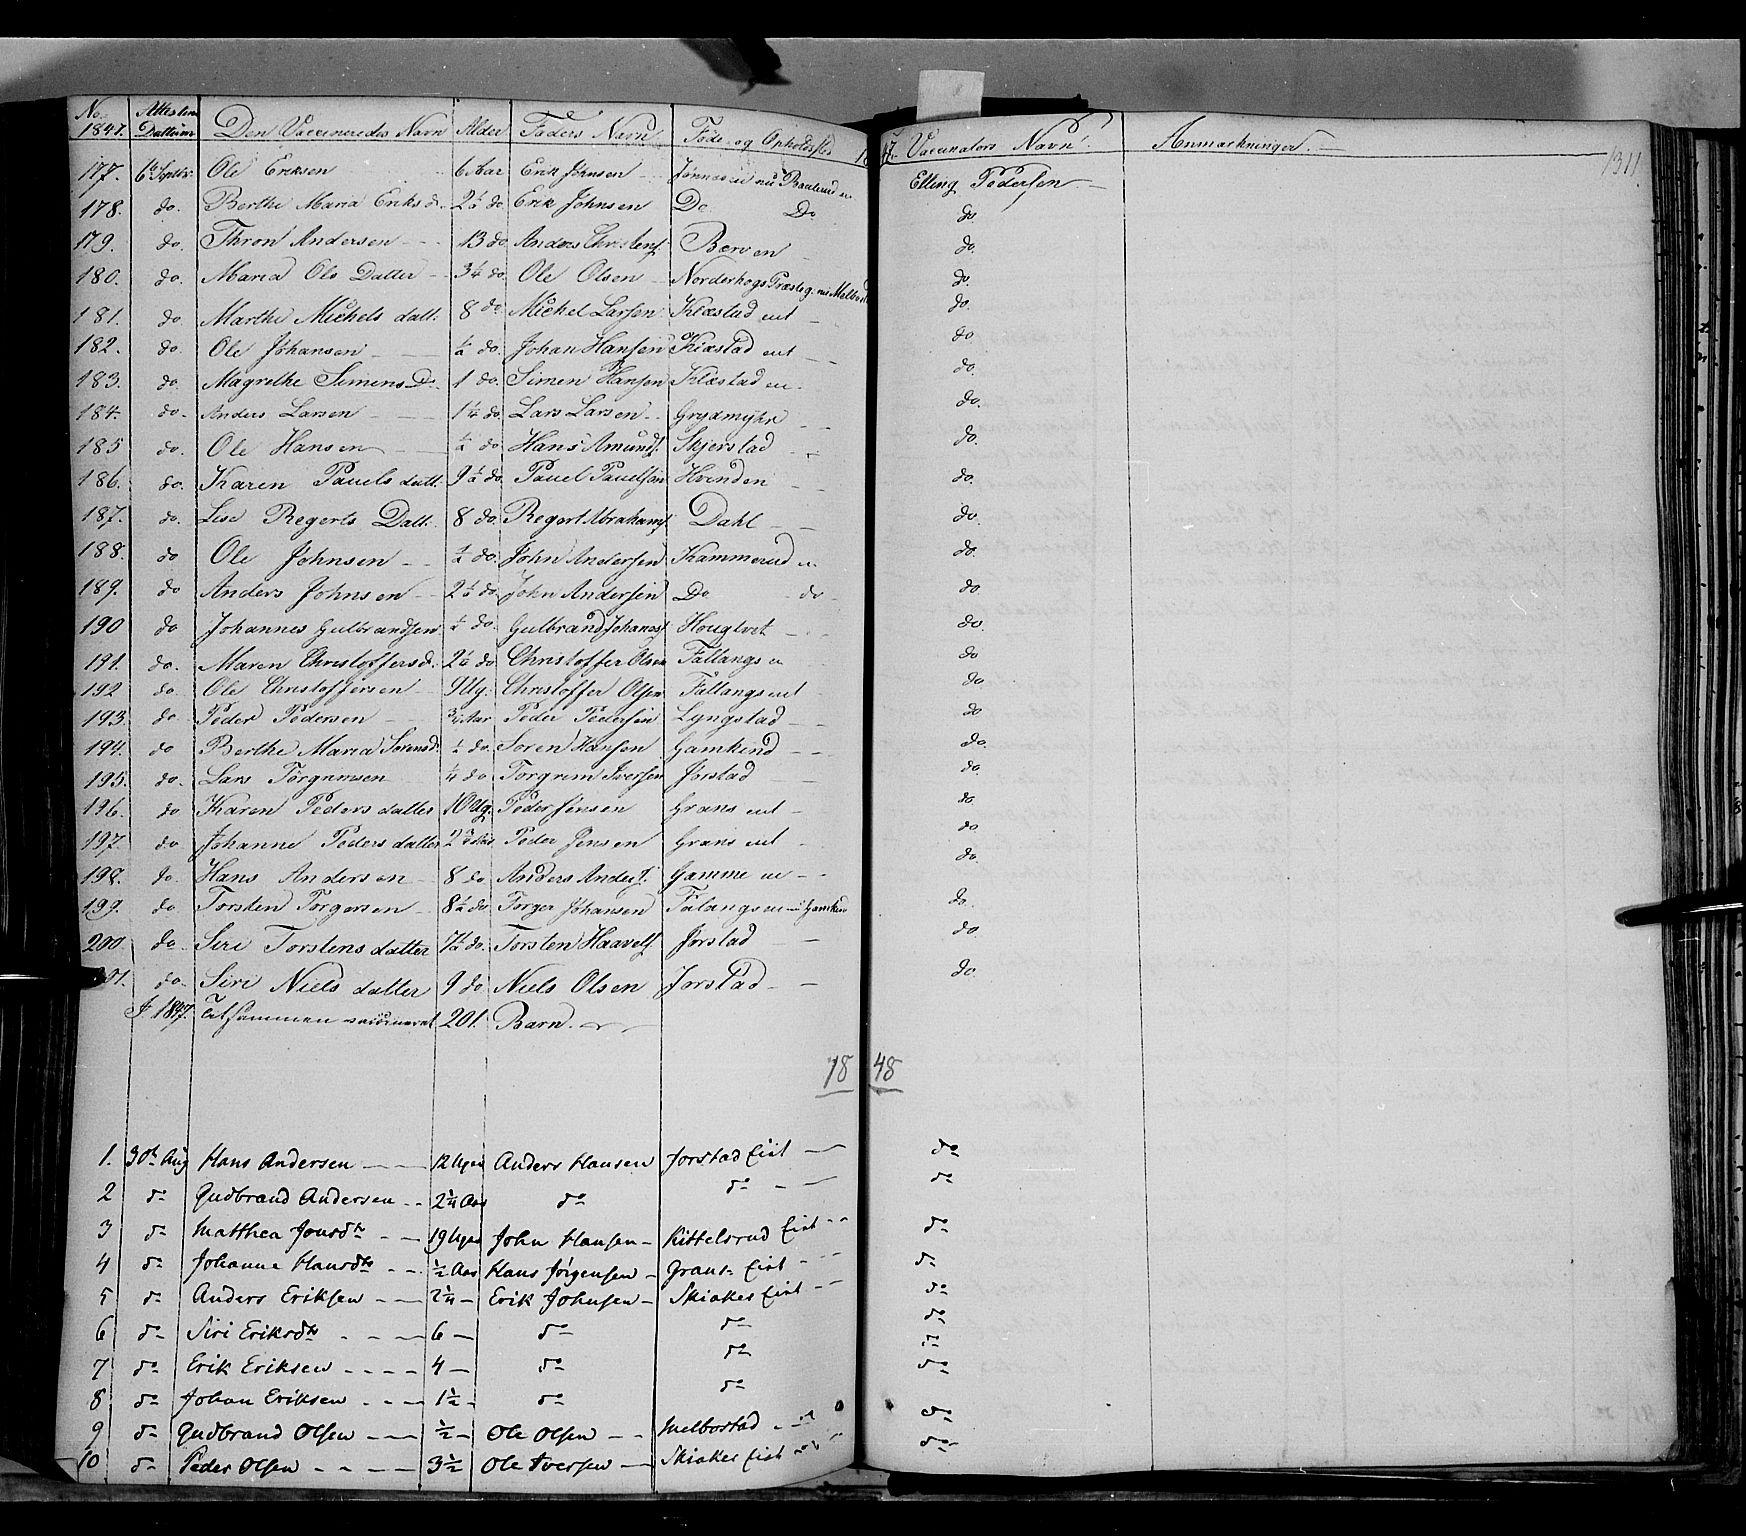 SAH, Gran prestekontor, Ministerialbok nr. 11, 1842-1856, s. 1310-1311